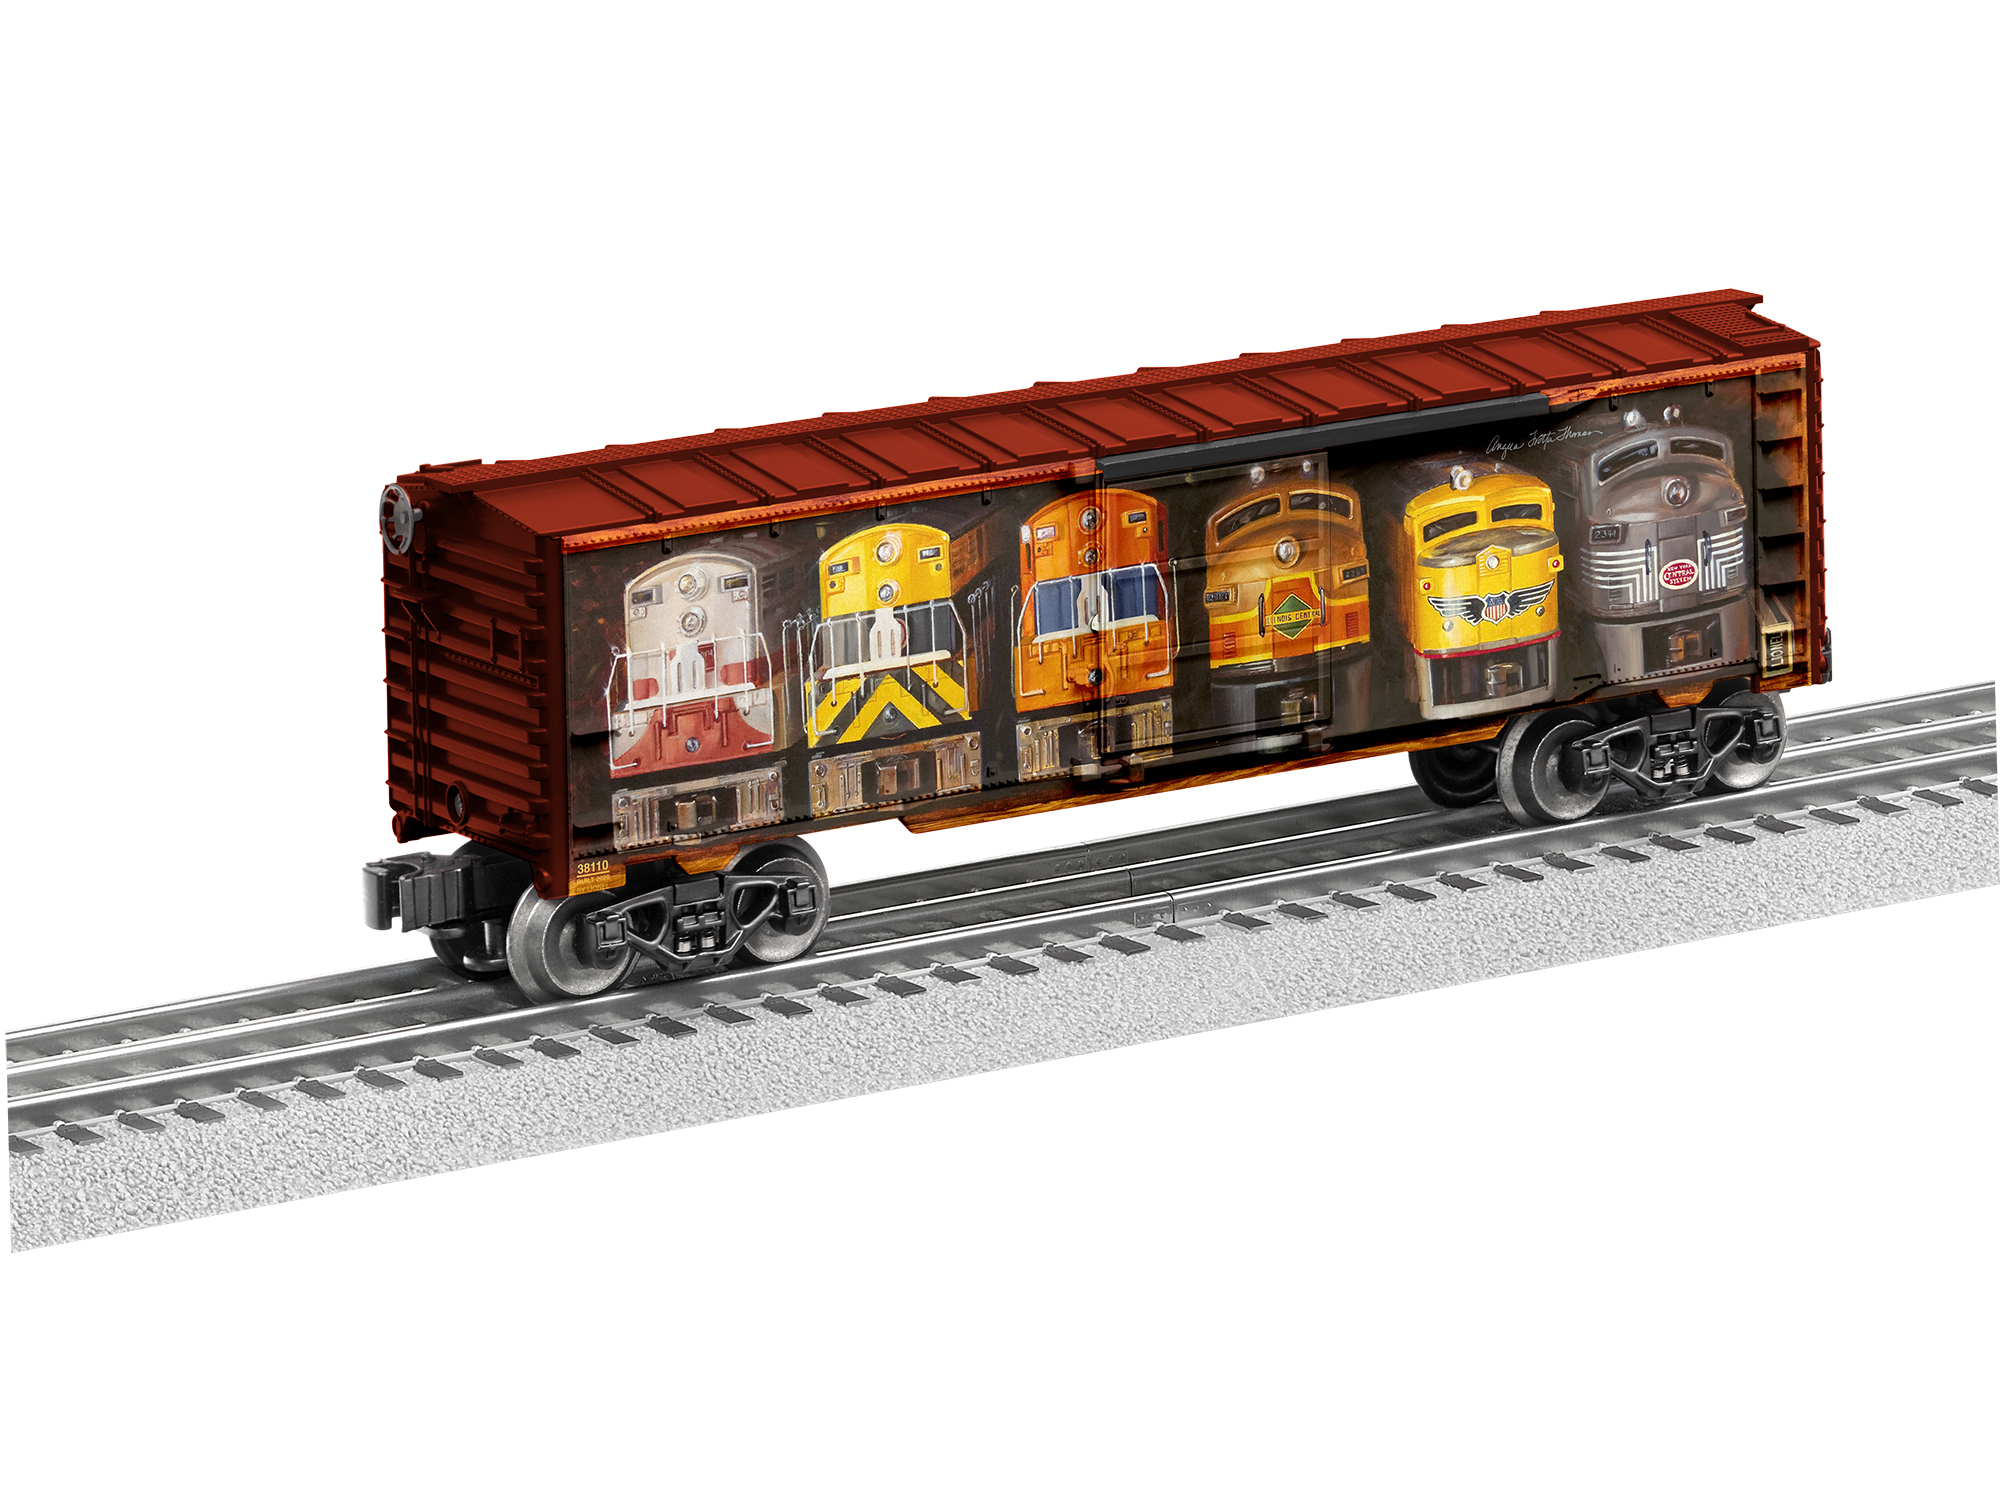 Lionel 2038110 O Boxcar 3-Rail RTR Angela Trotta Thomas Well Stocked Shelves Middle Shelf 434-2038110